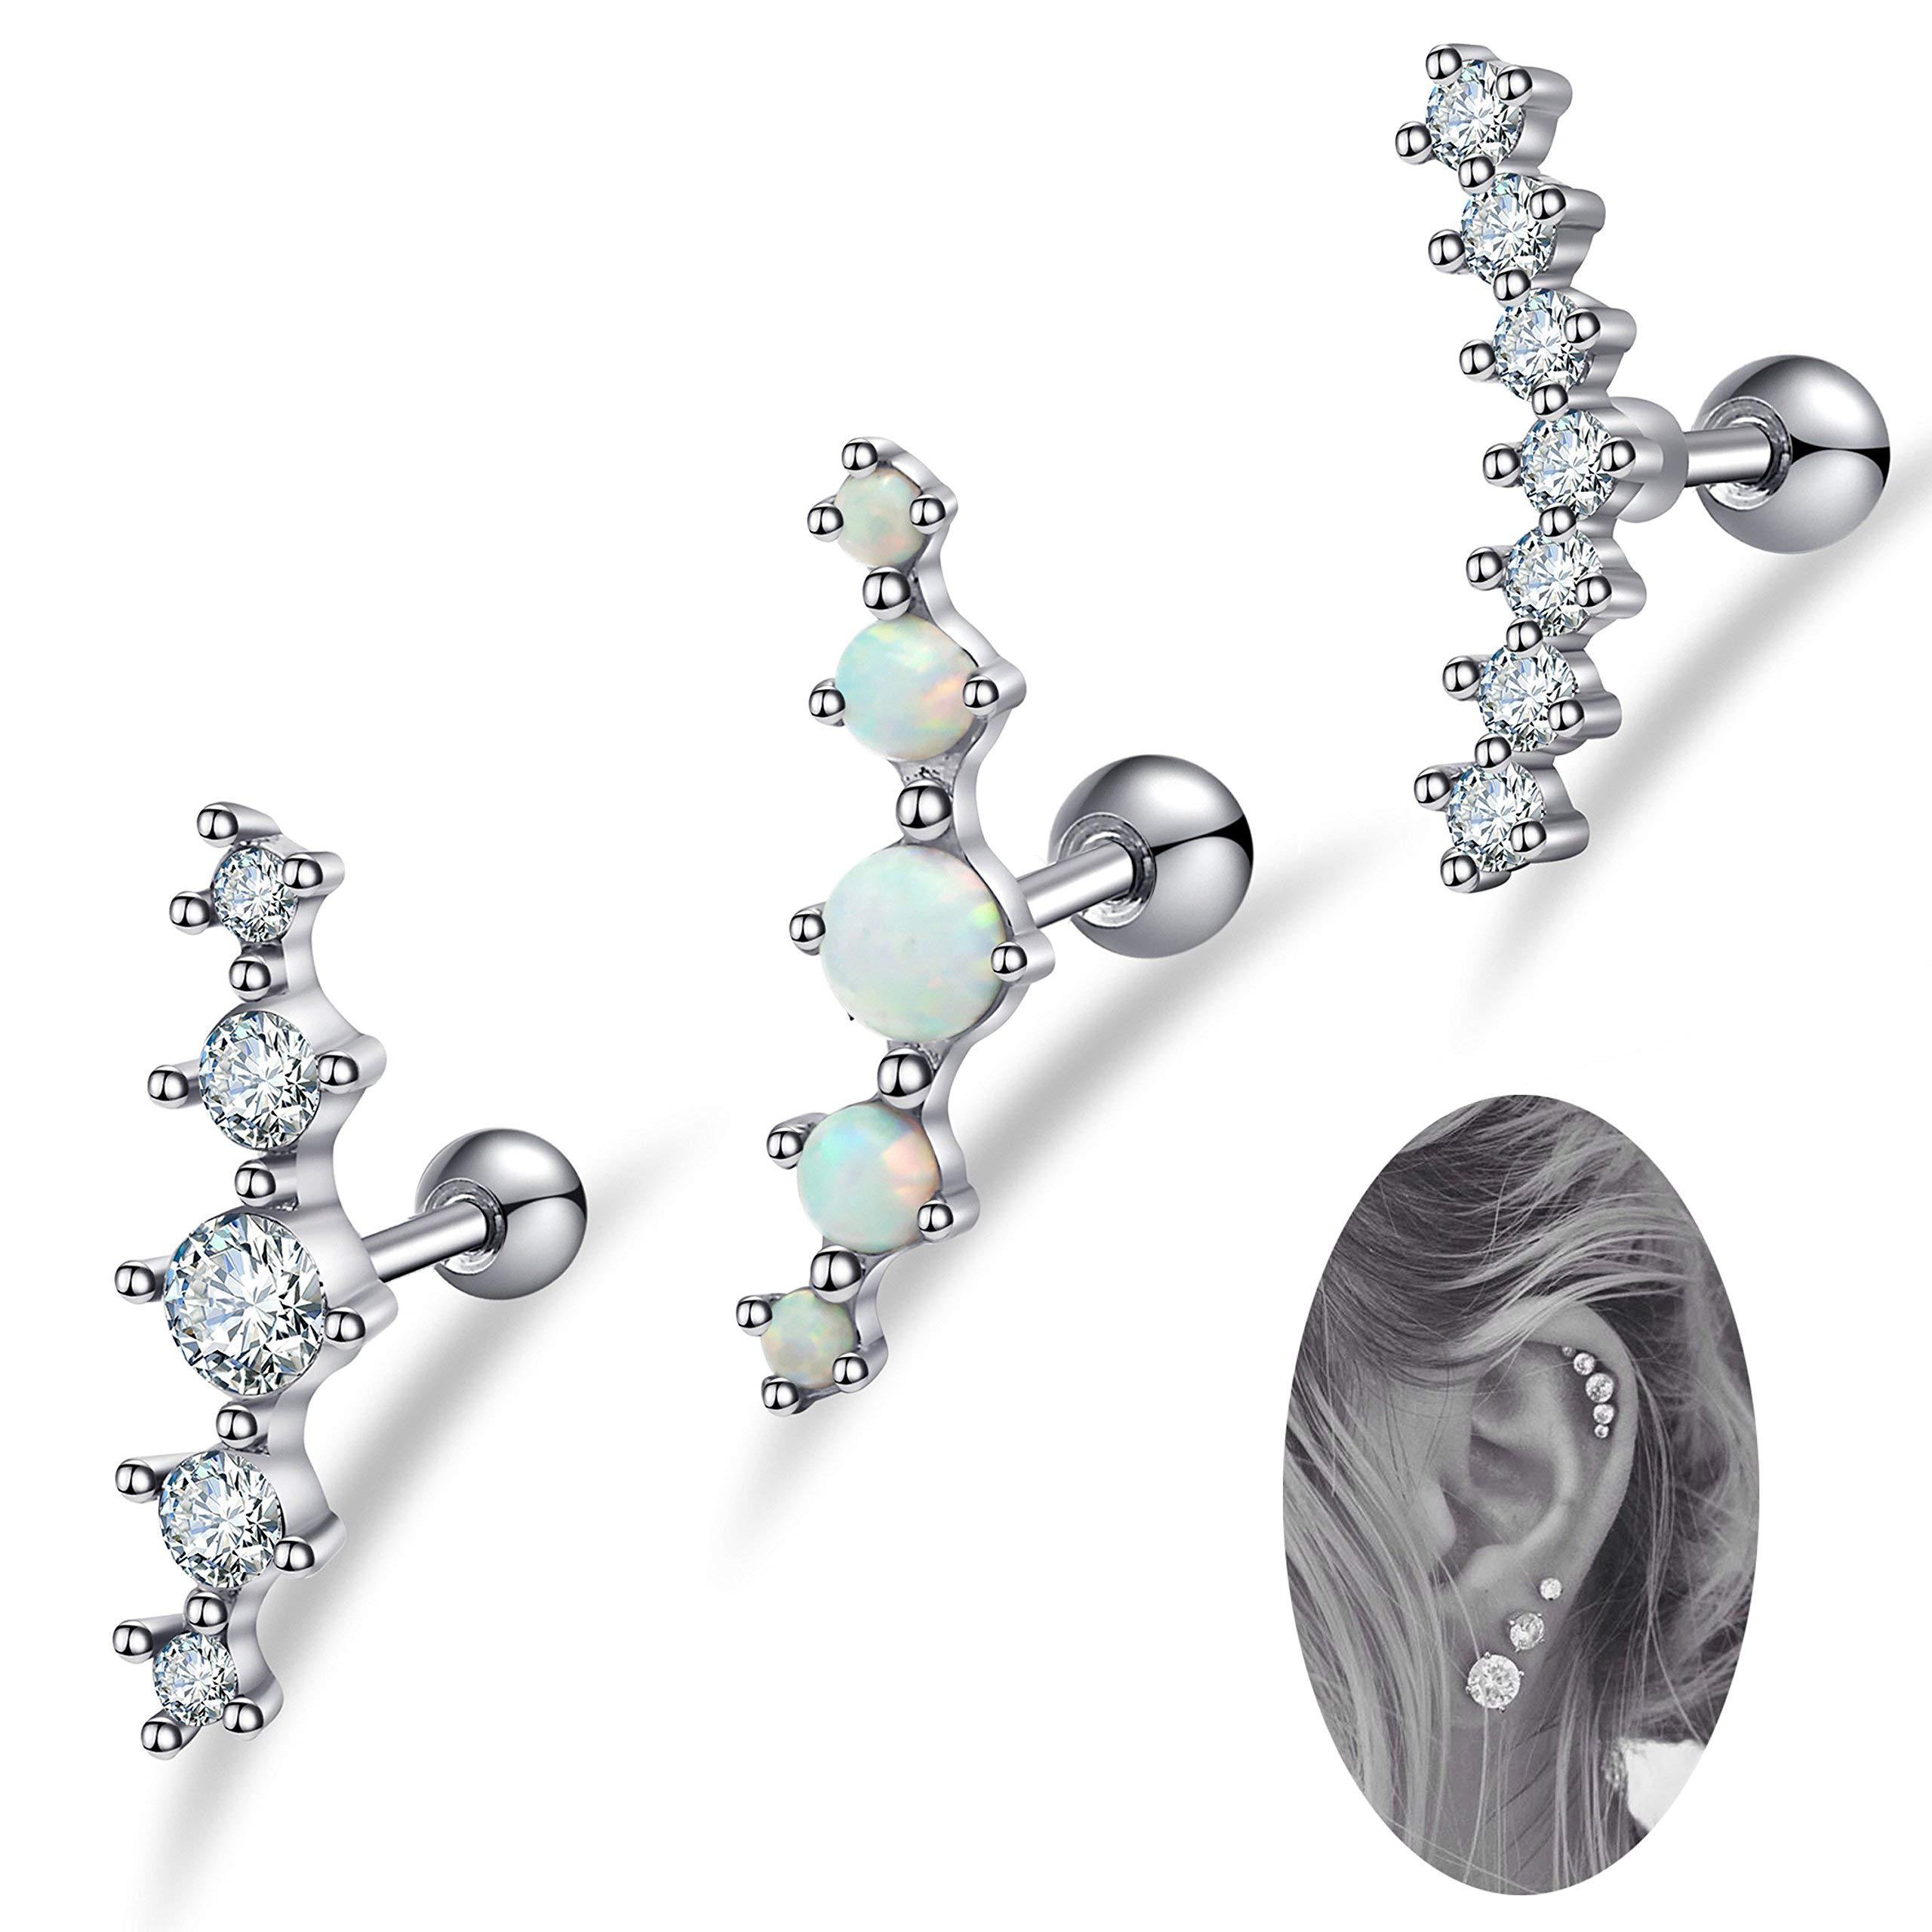 FIBO STEEL Stainless Cartilage Earrings